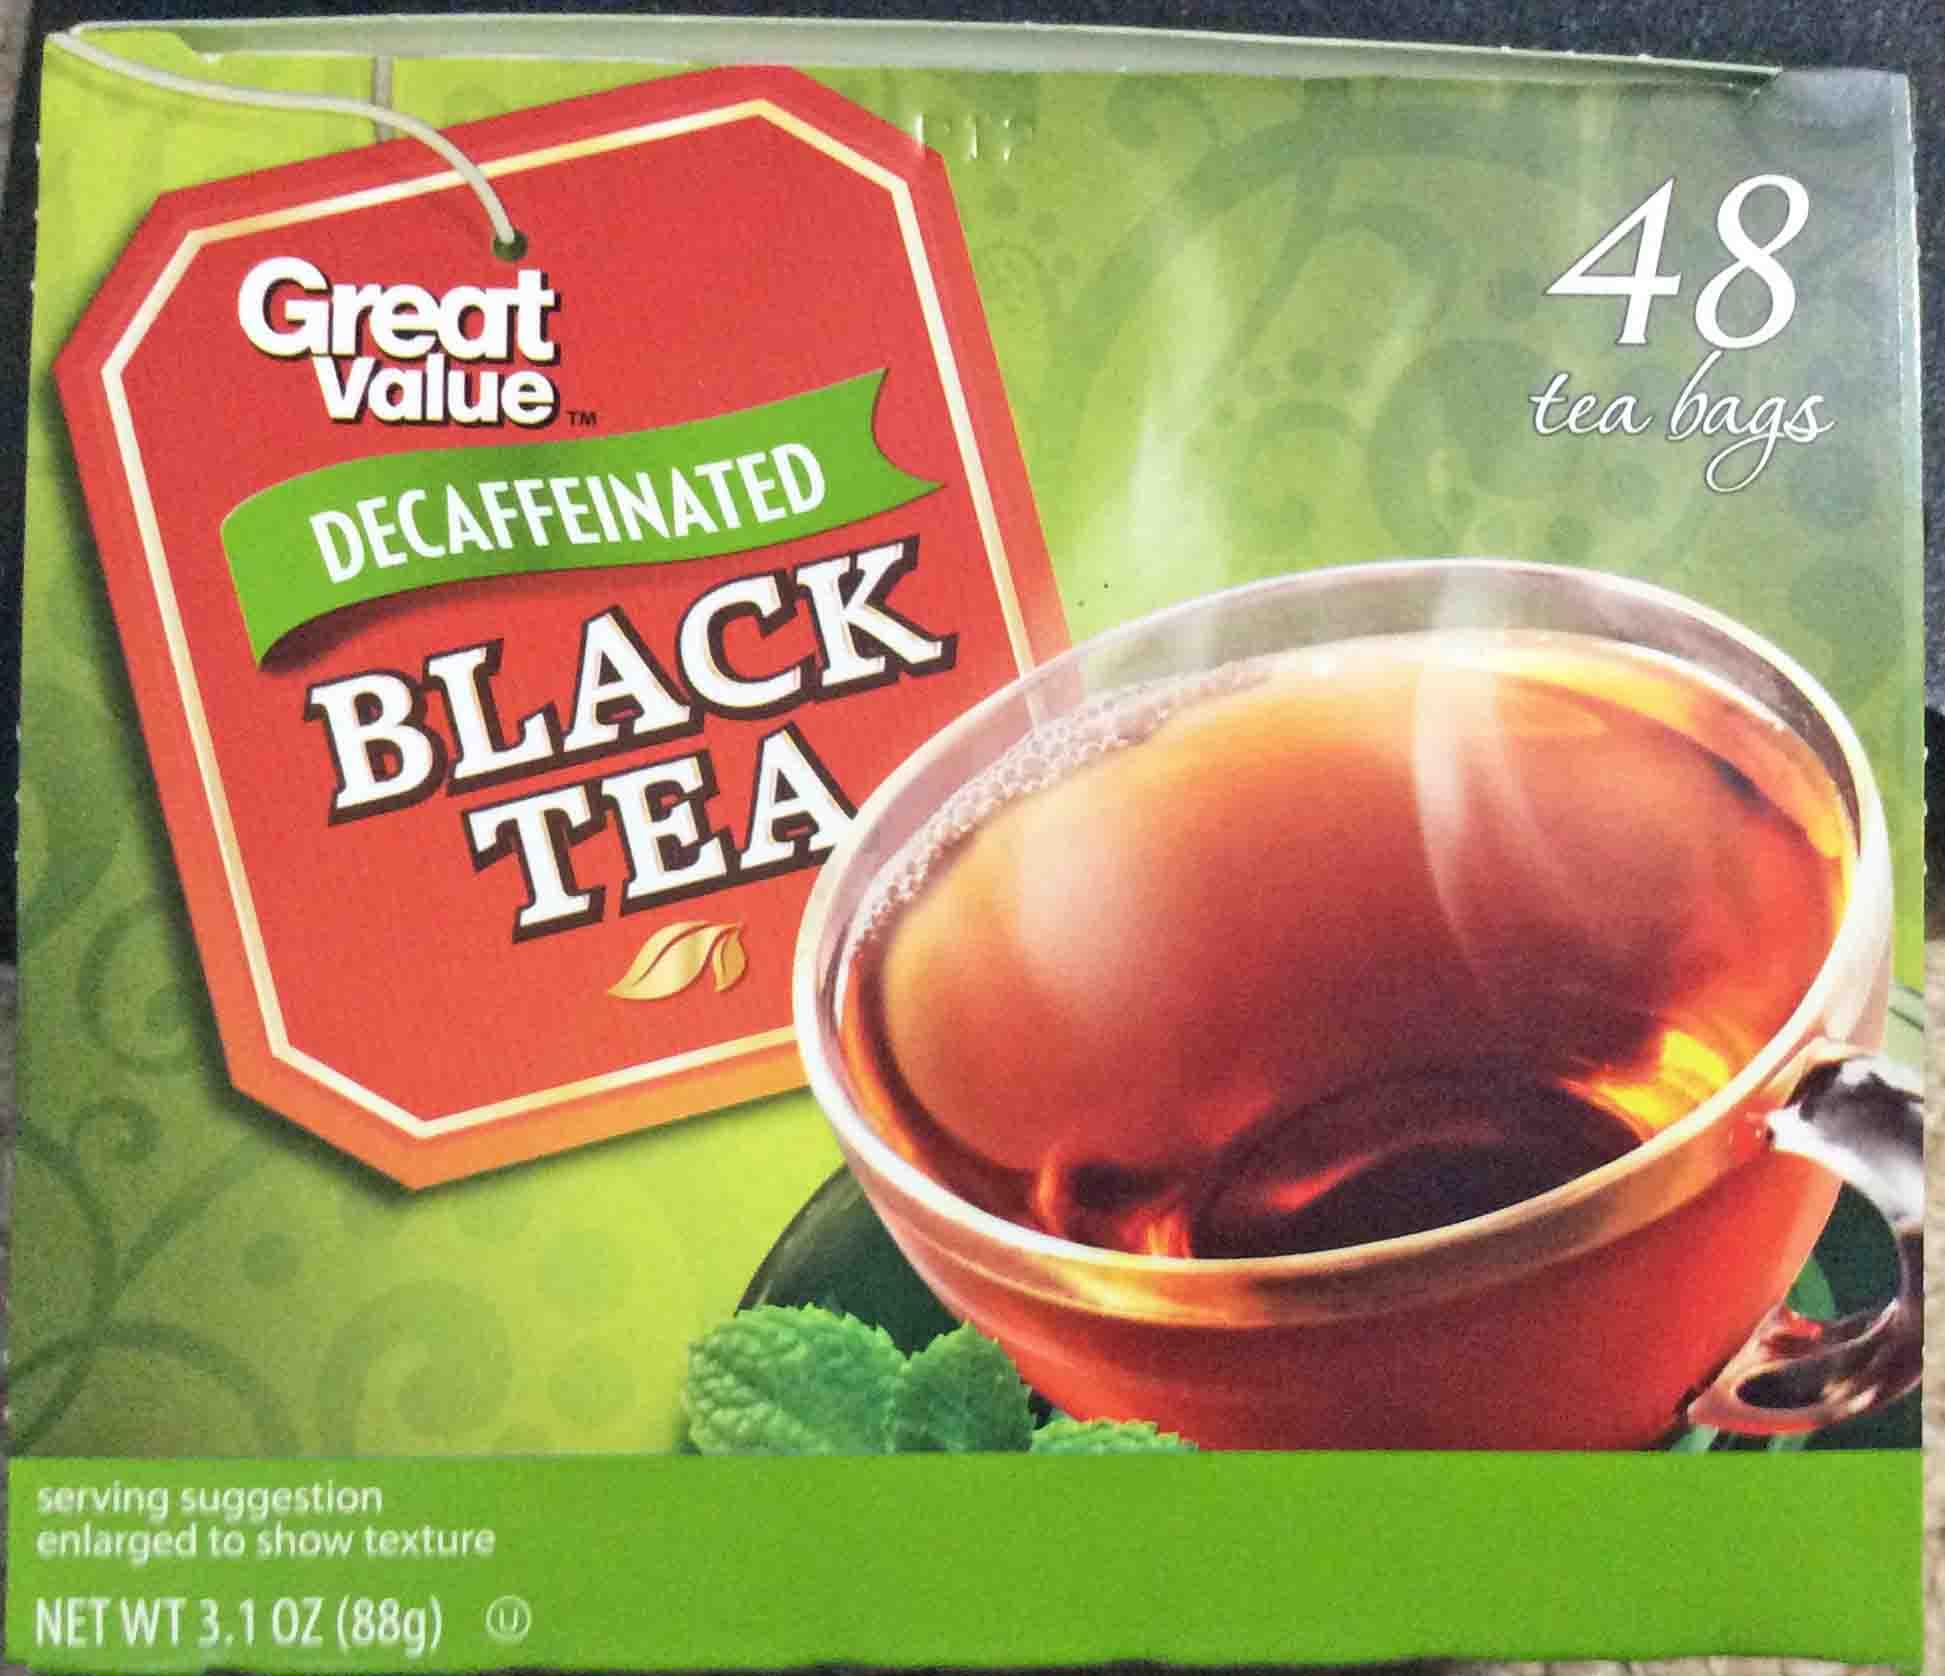 Drinking Too Much Decaffeinated Black Tea